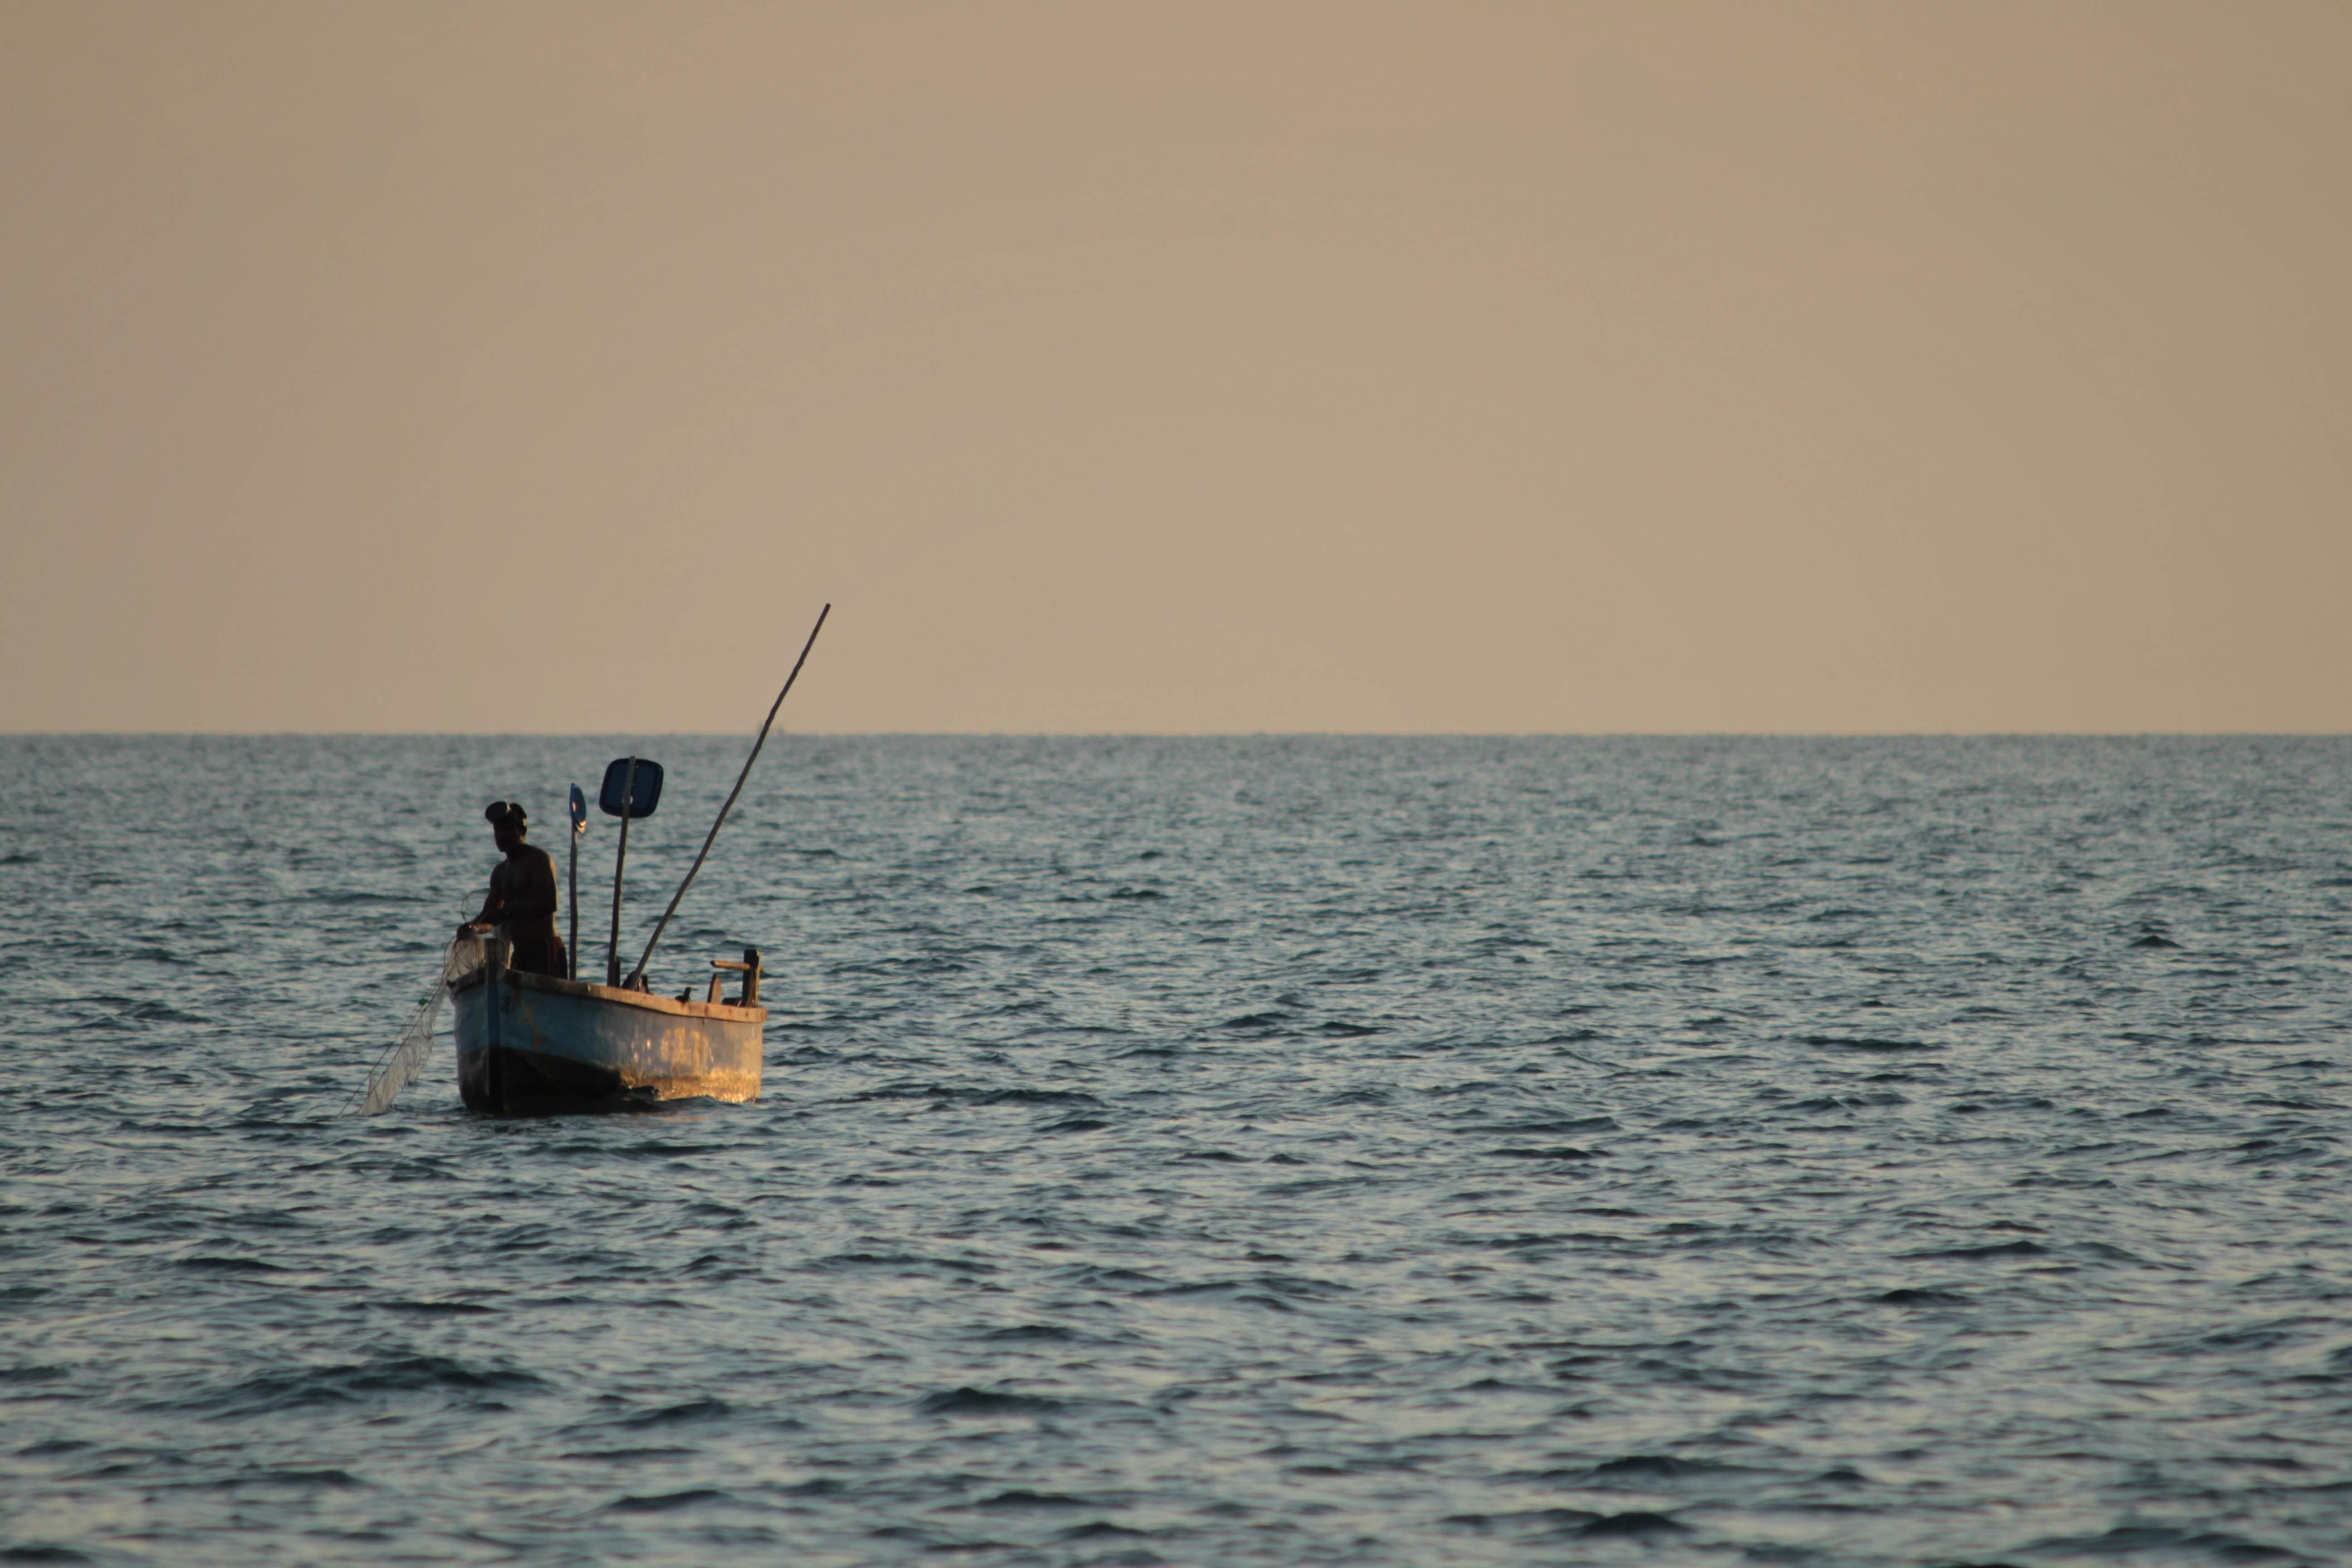 An artisanal fisherman. Credit: Rahul Muralidharan